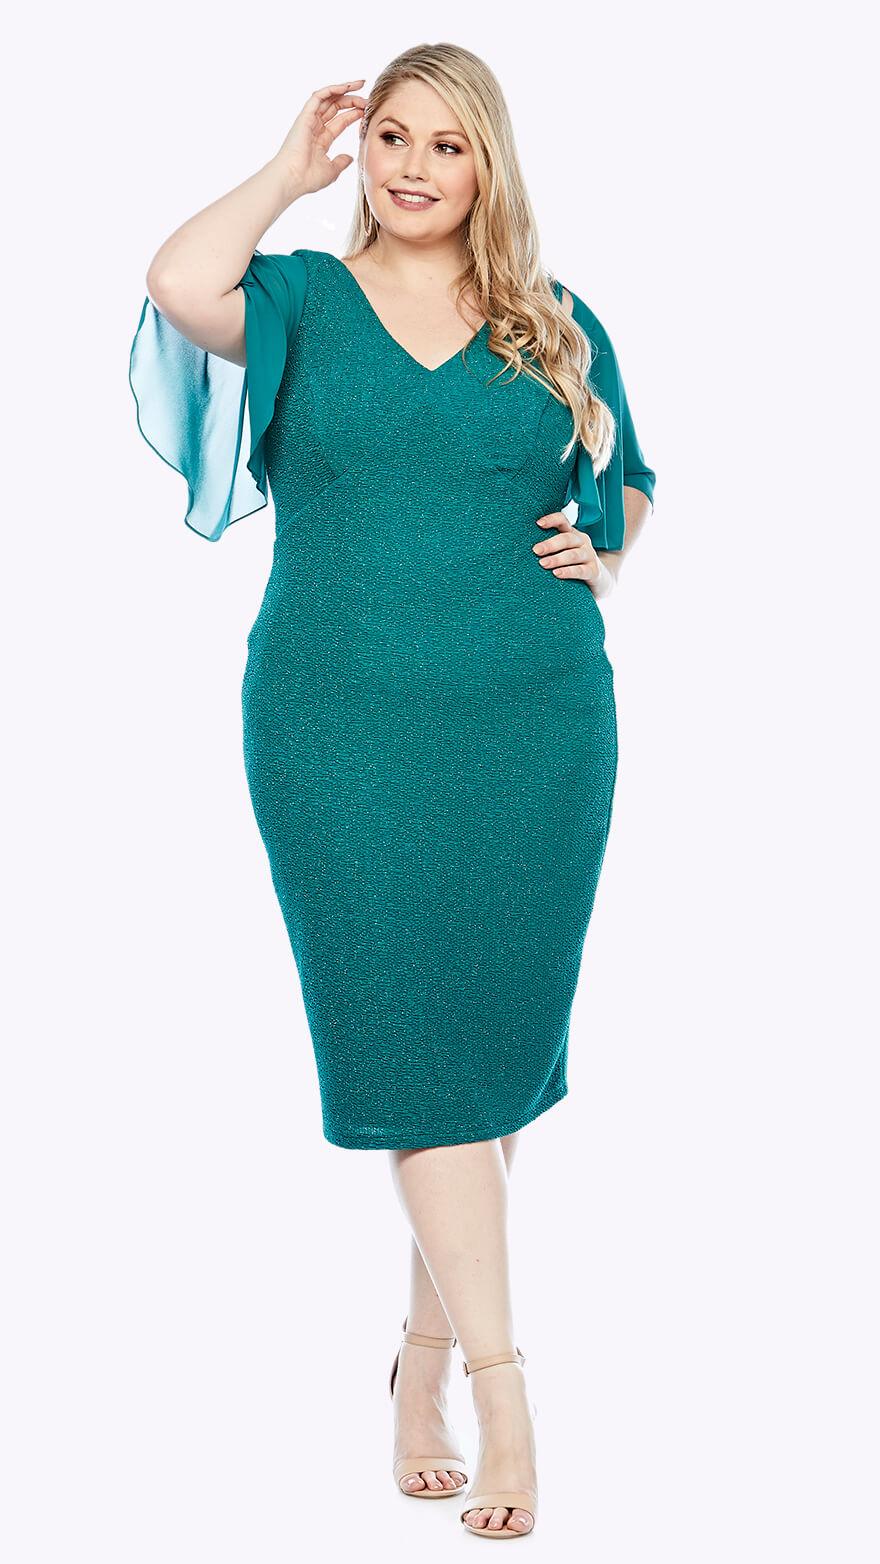 LJ0387 Knee-length stretch lurex dress with flounced chiffon sleeve